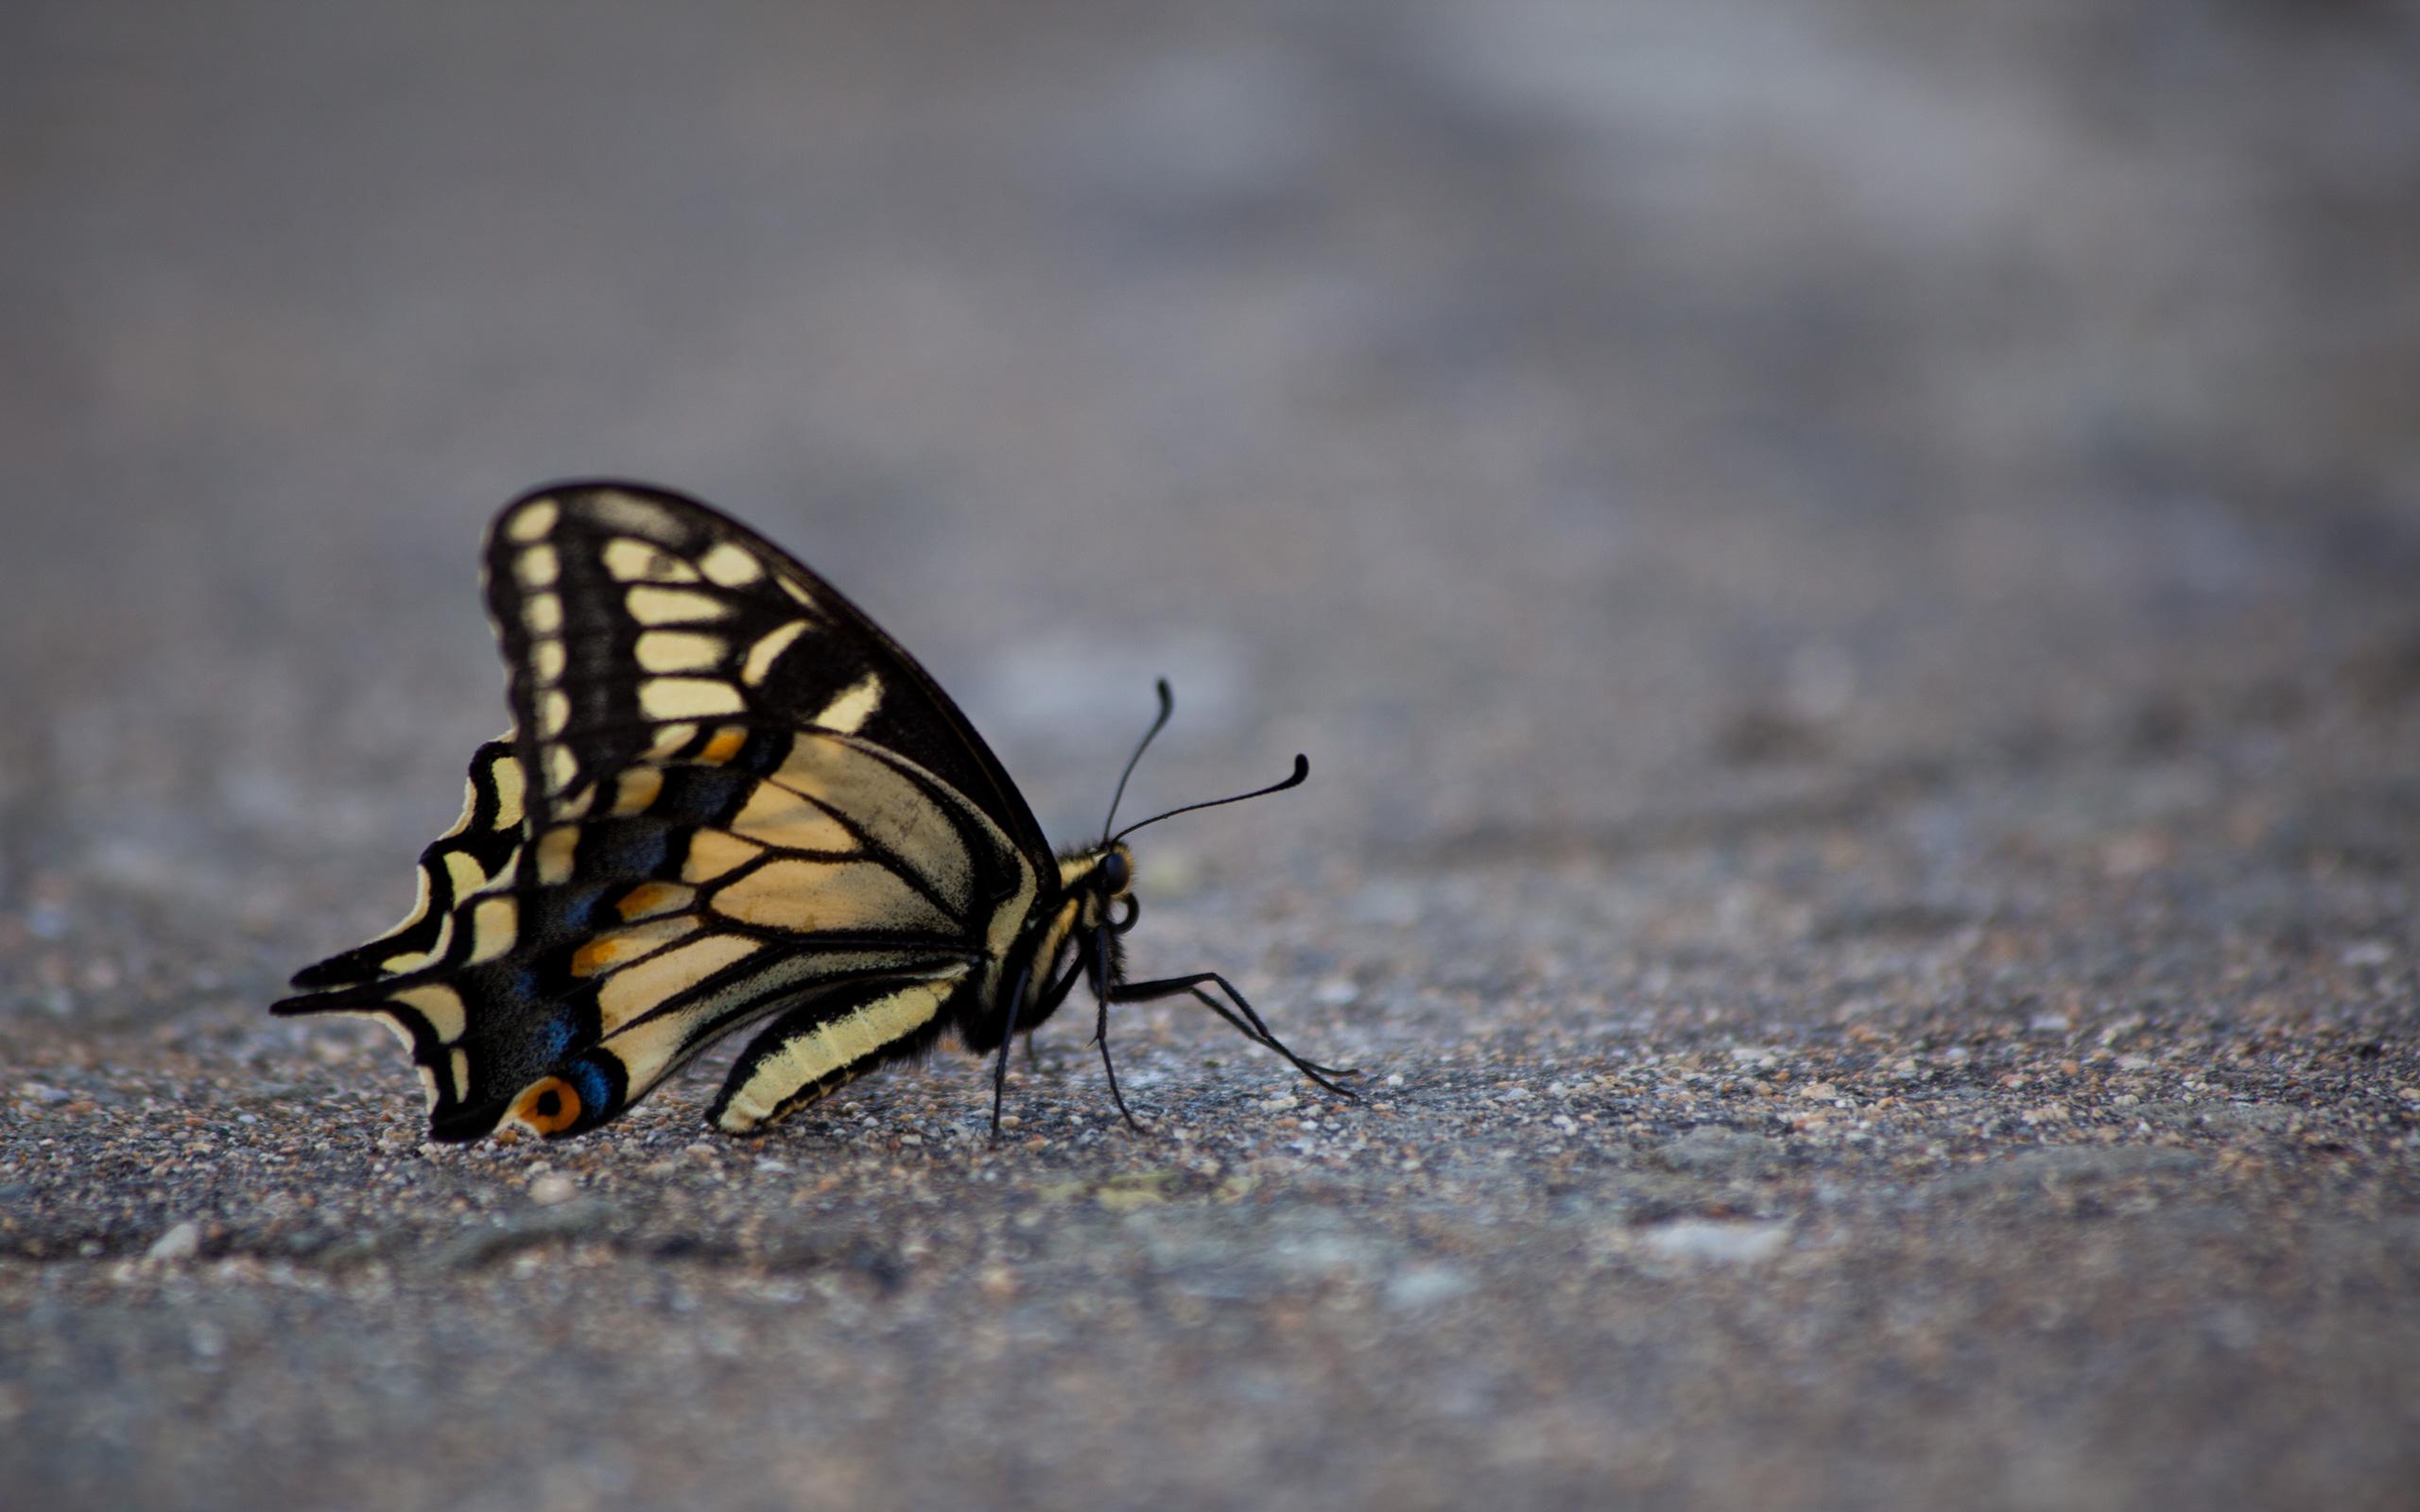 4774188105 c10e0da5b7 o butterfly   desktop background wallpaper